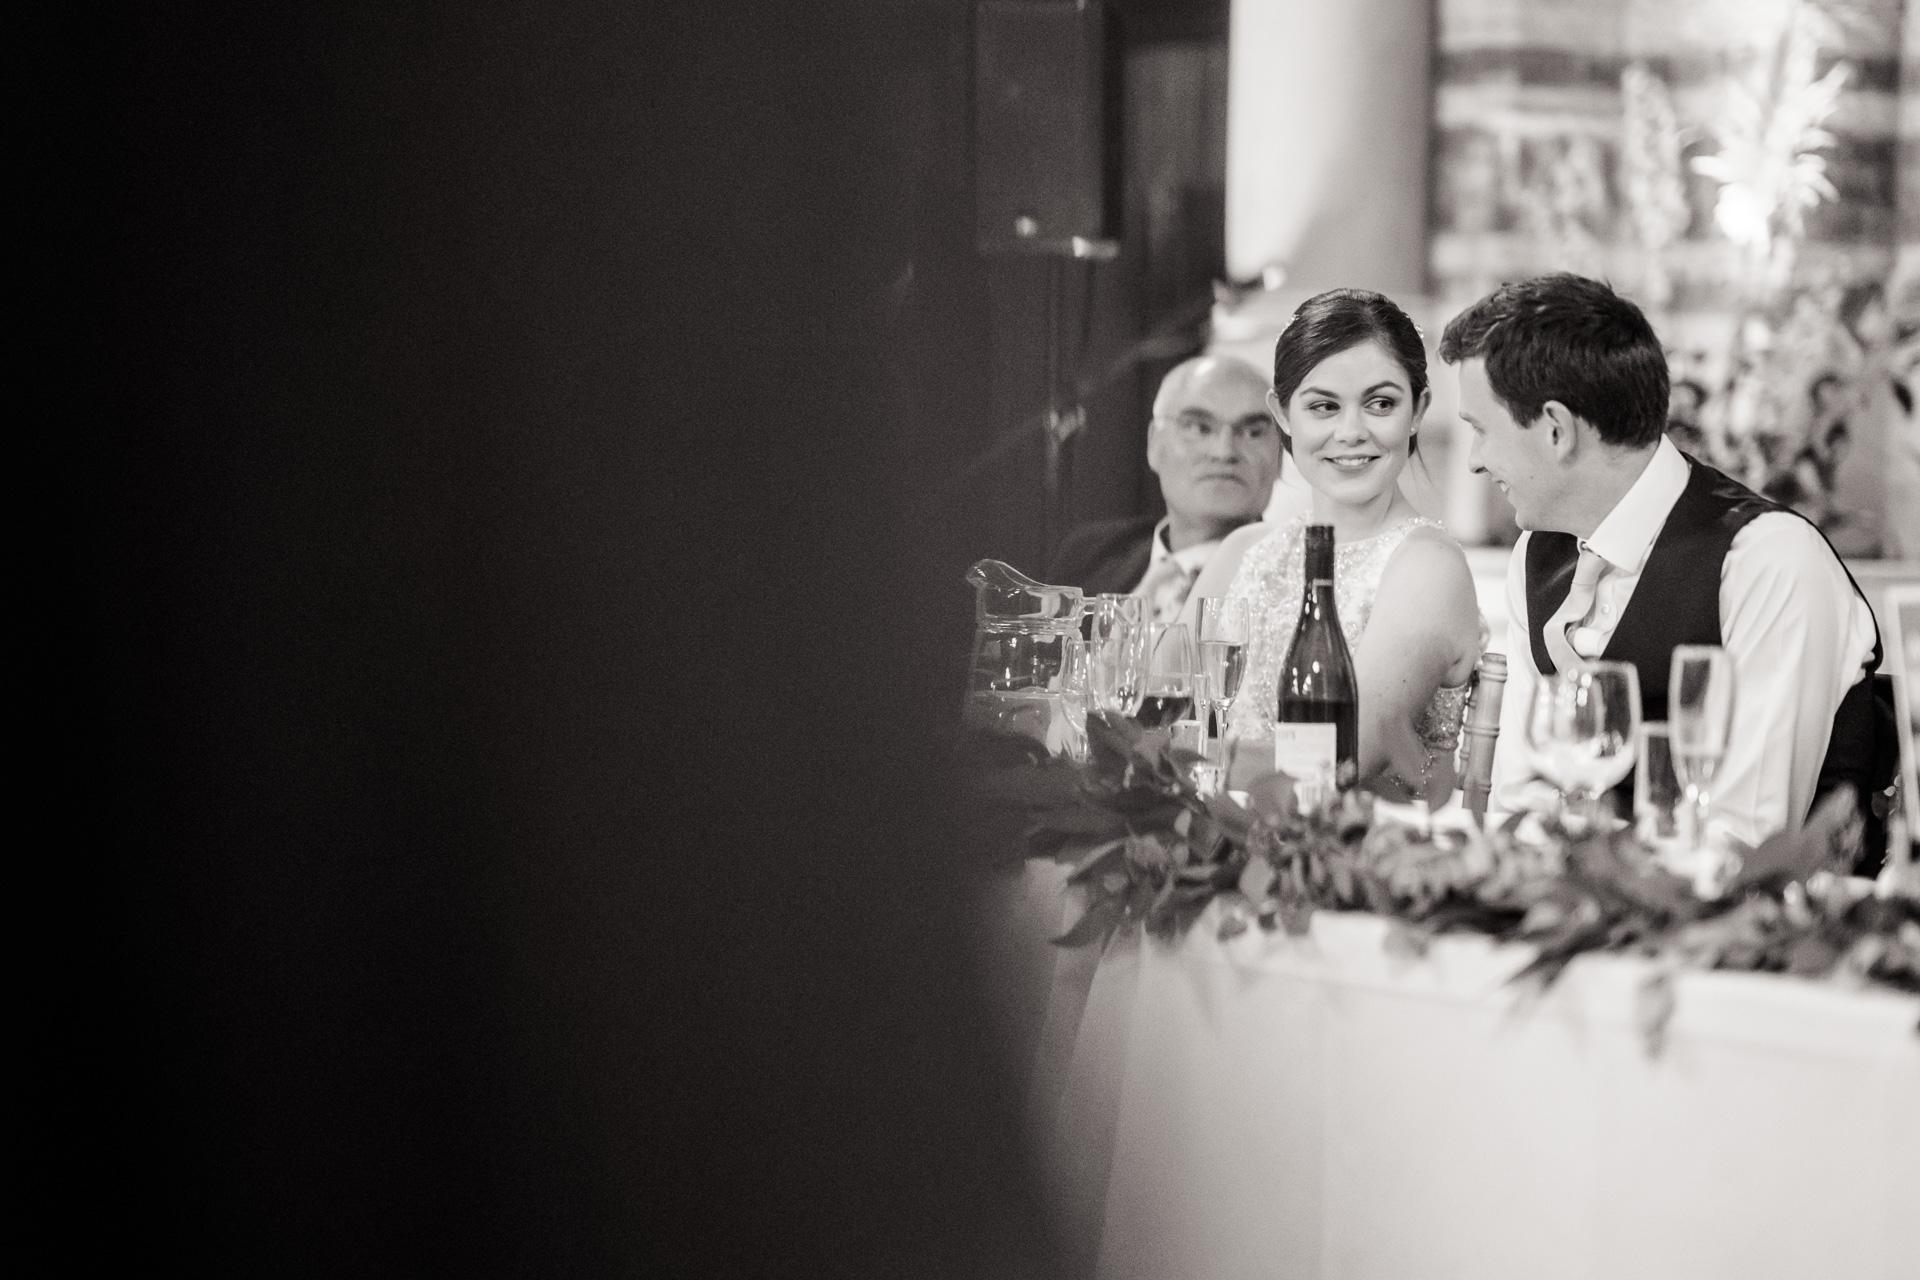 st-stephens-hampstead-wedding-photographer-035